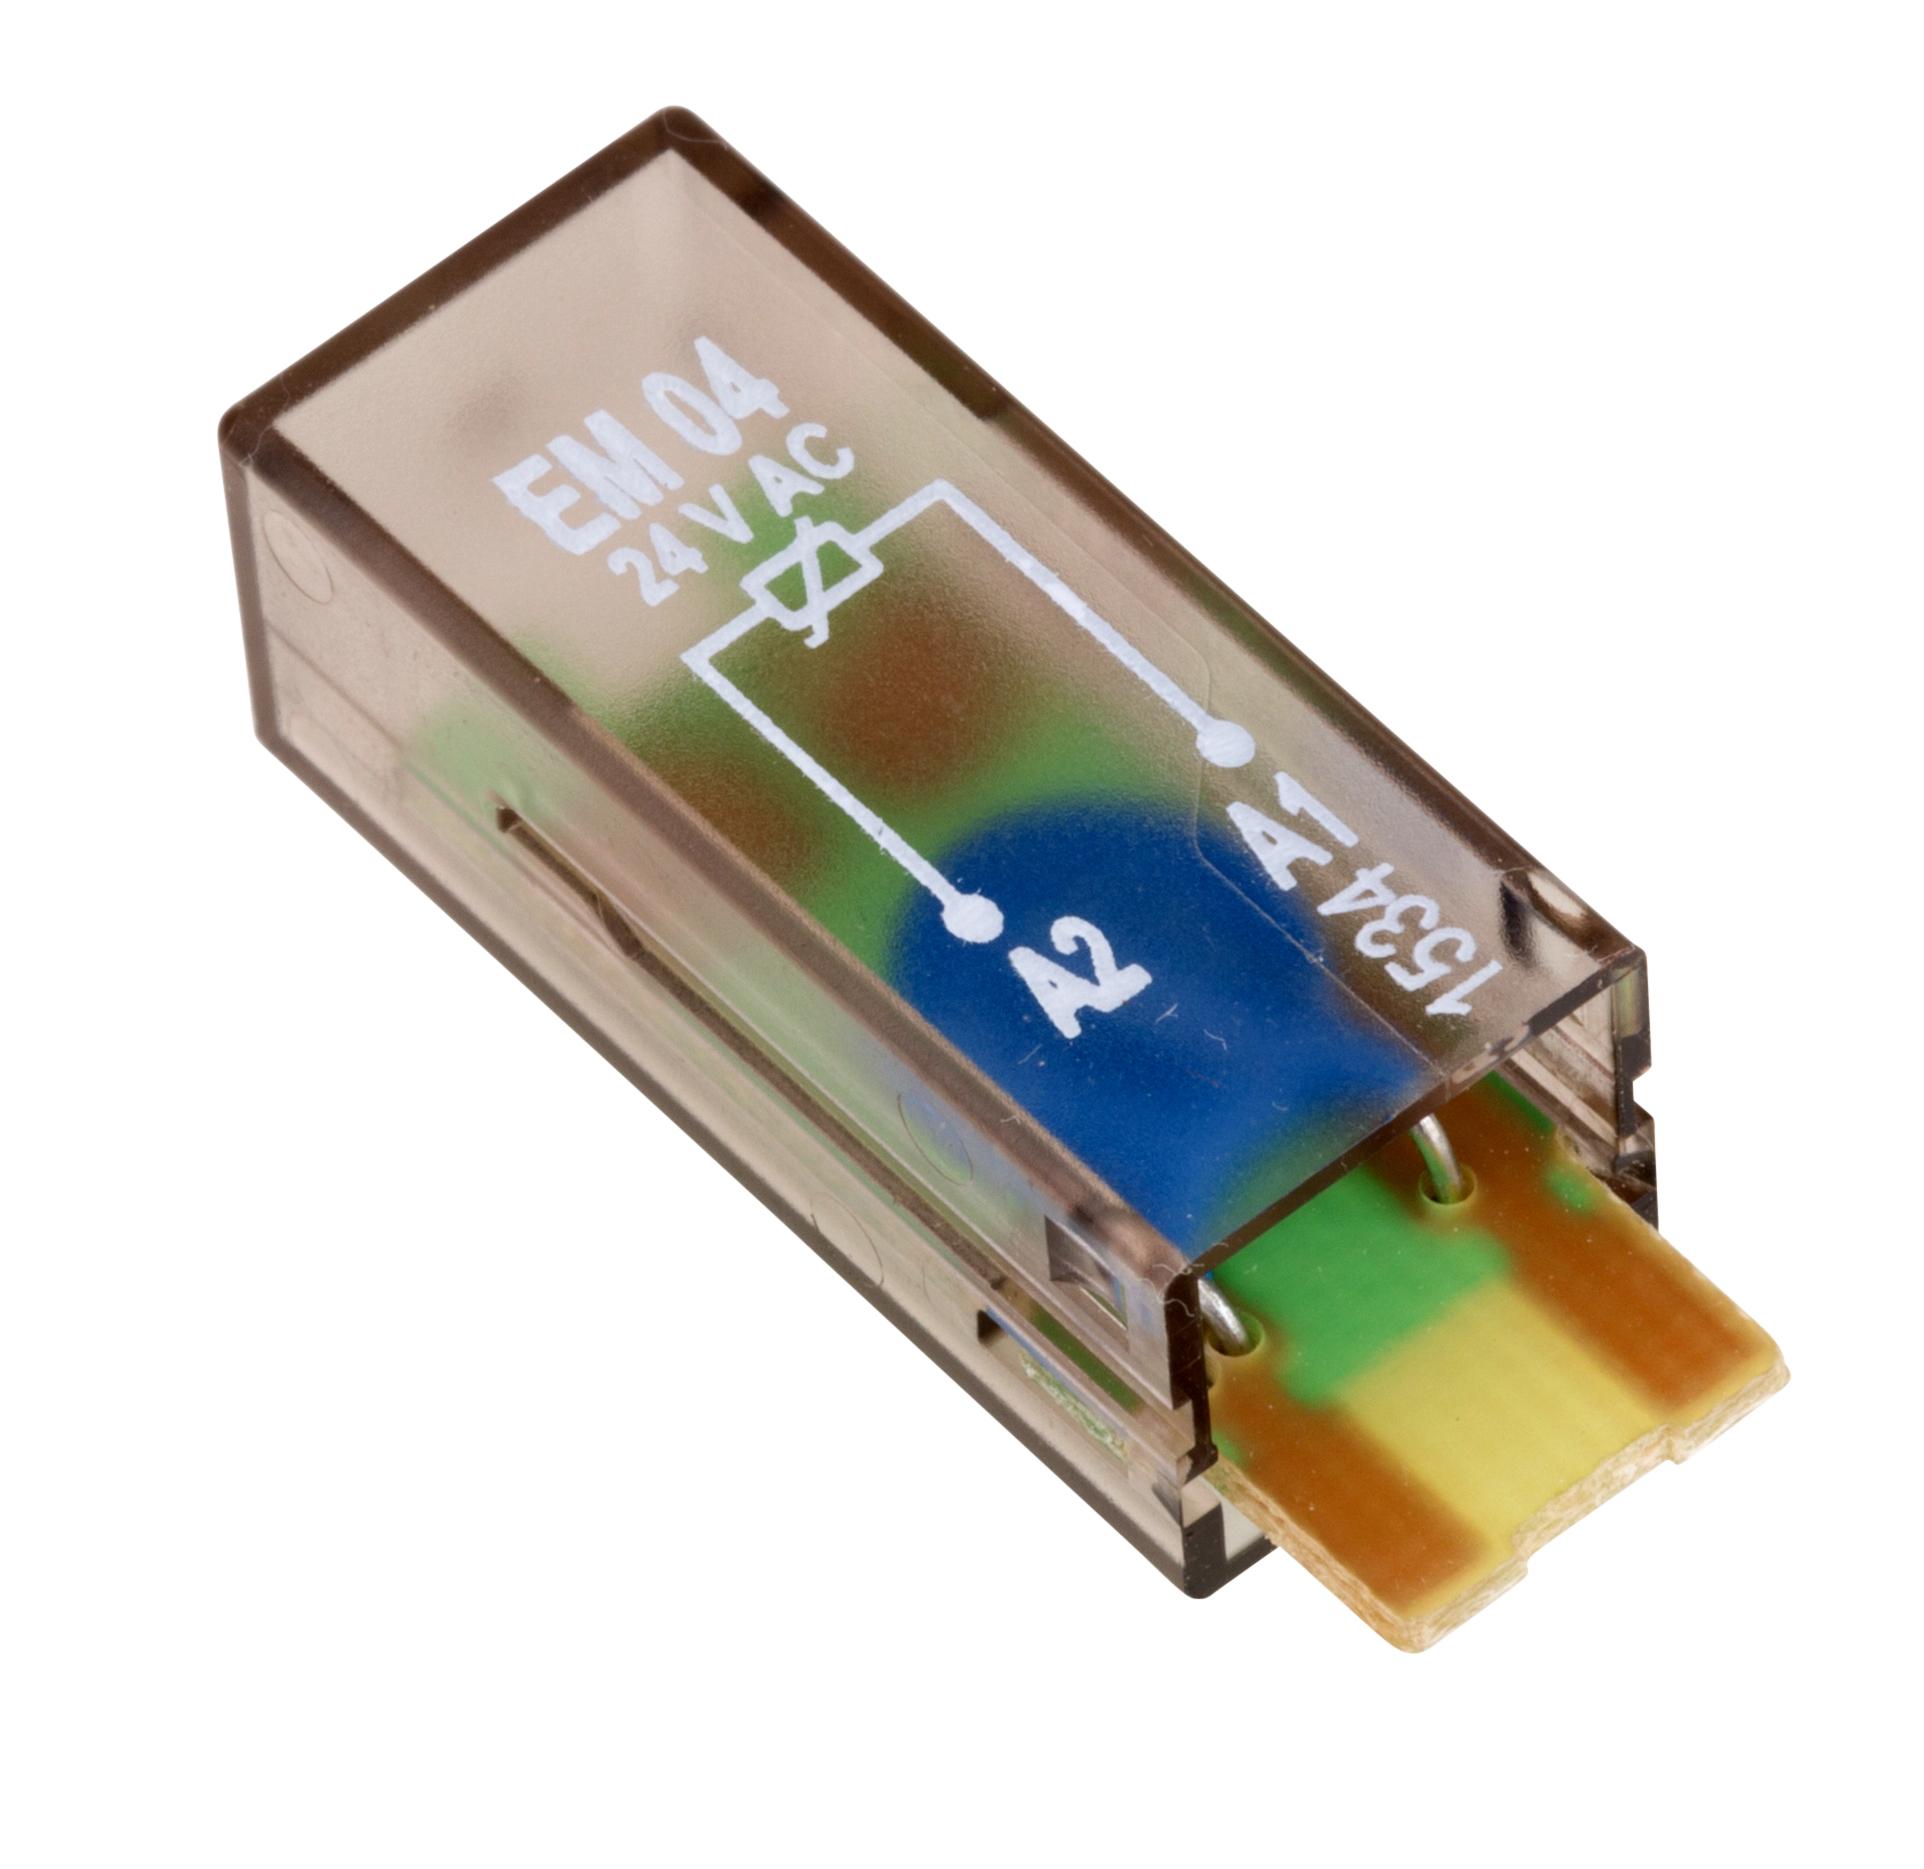 1 Stk Varistor-Steckmodul, 24V-AC, EM04 YMVAW024--